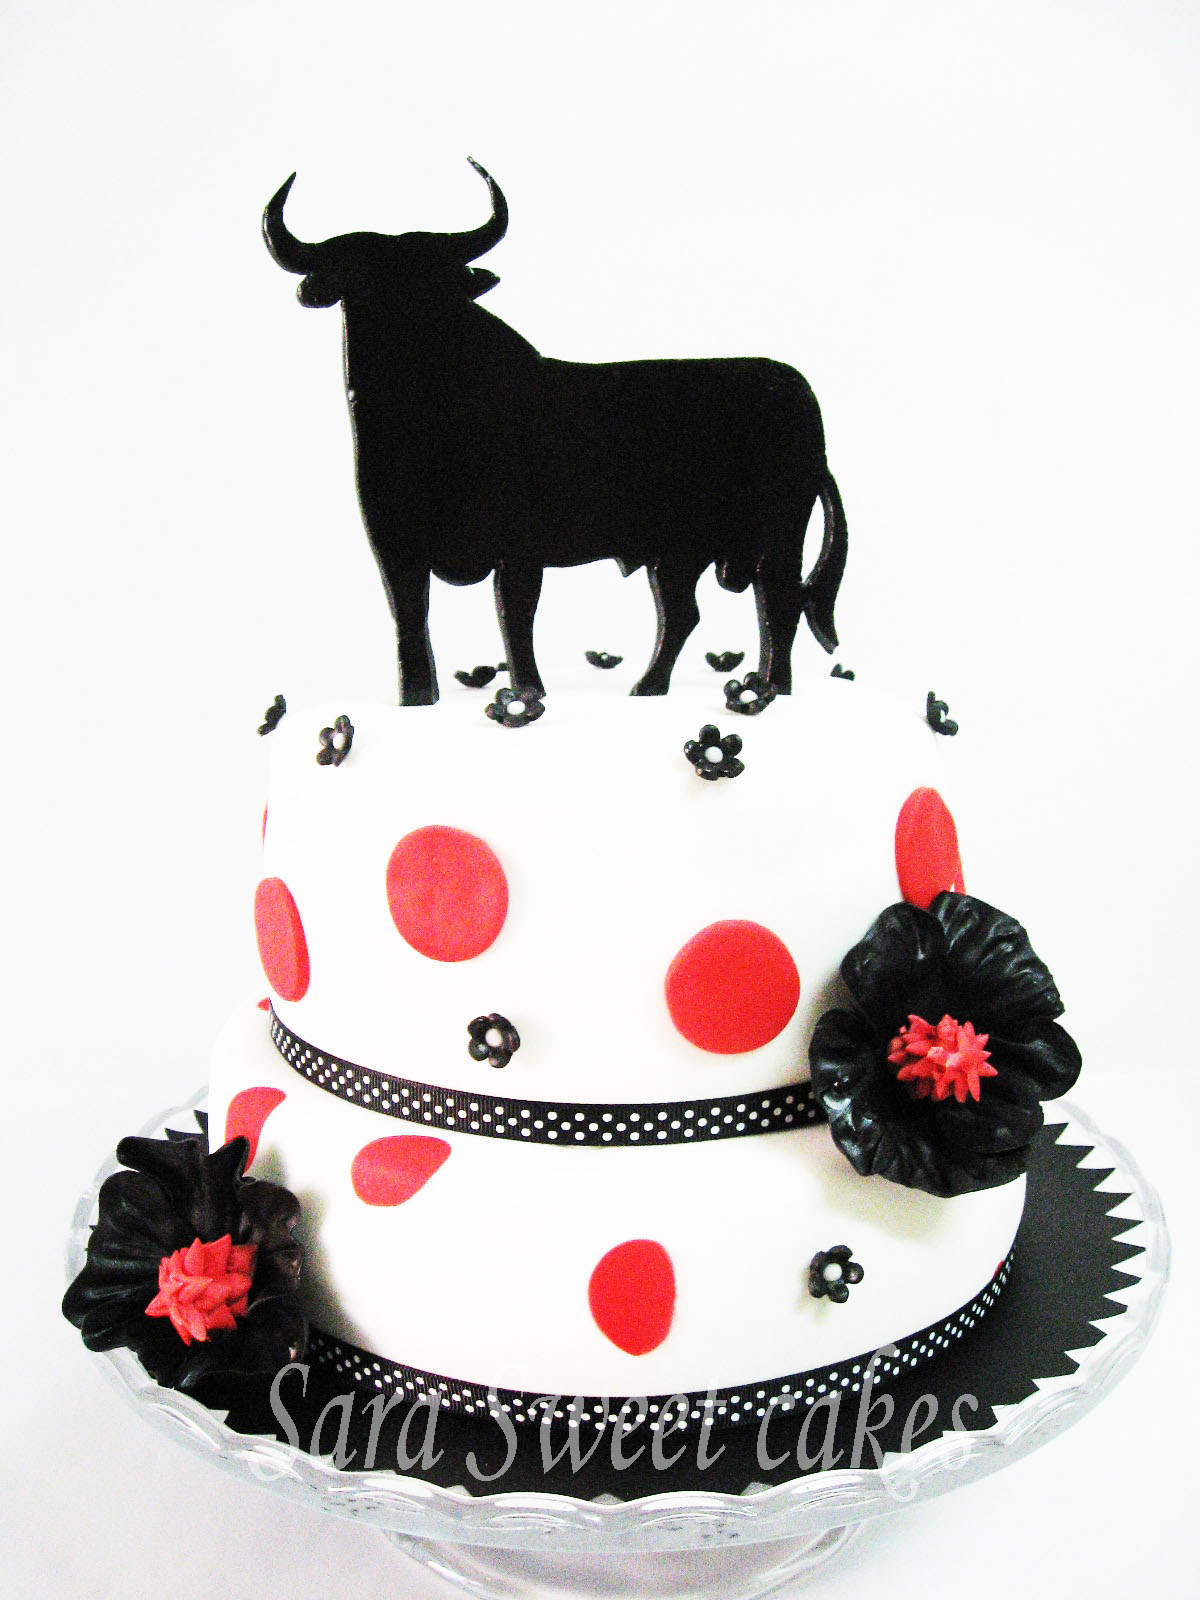 Sara Sweet Cakes Tartas